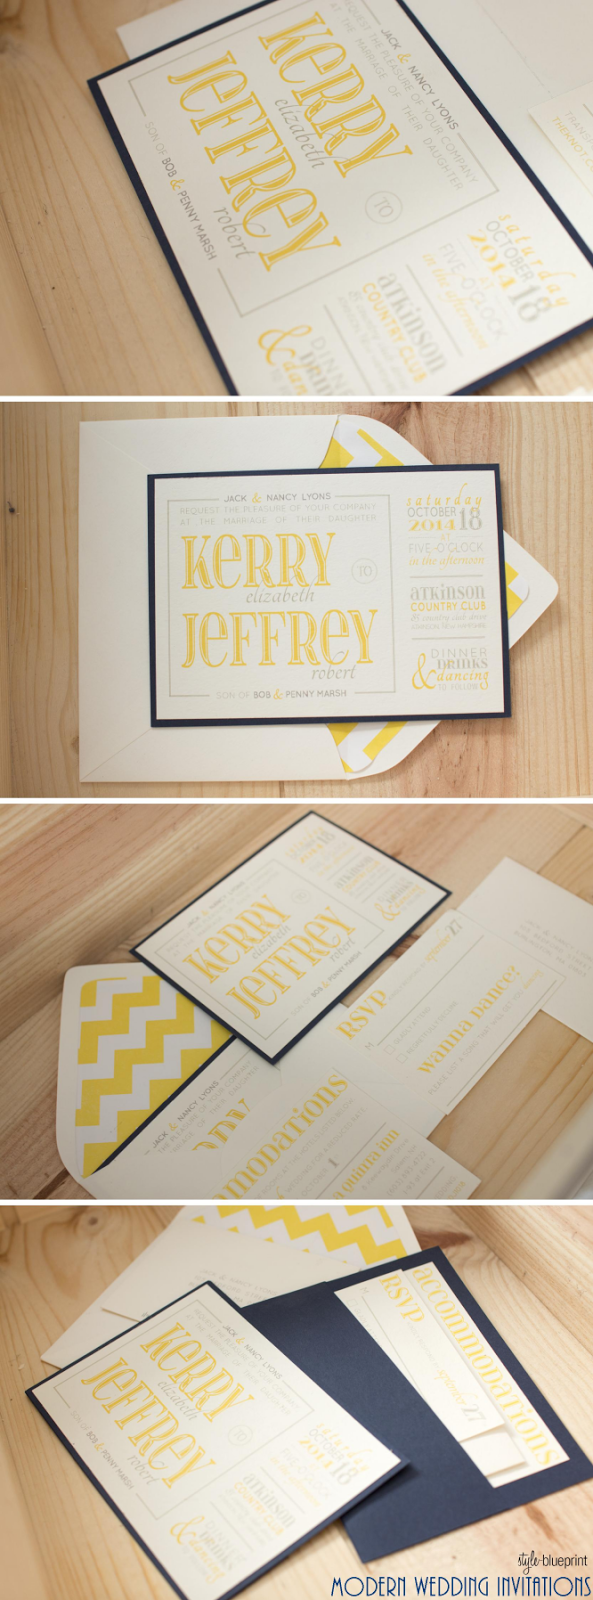 Kerry and Jeff\'s Wedding Invitations // modern wedding invitations ...